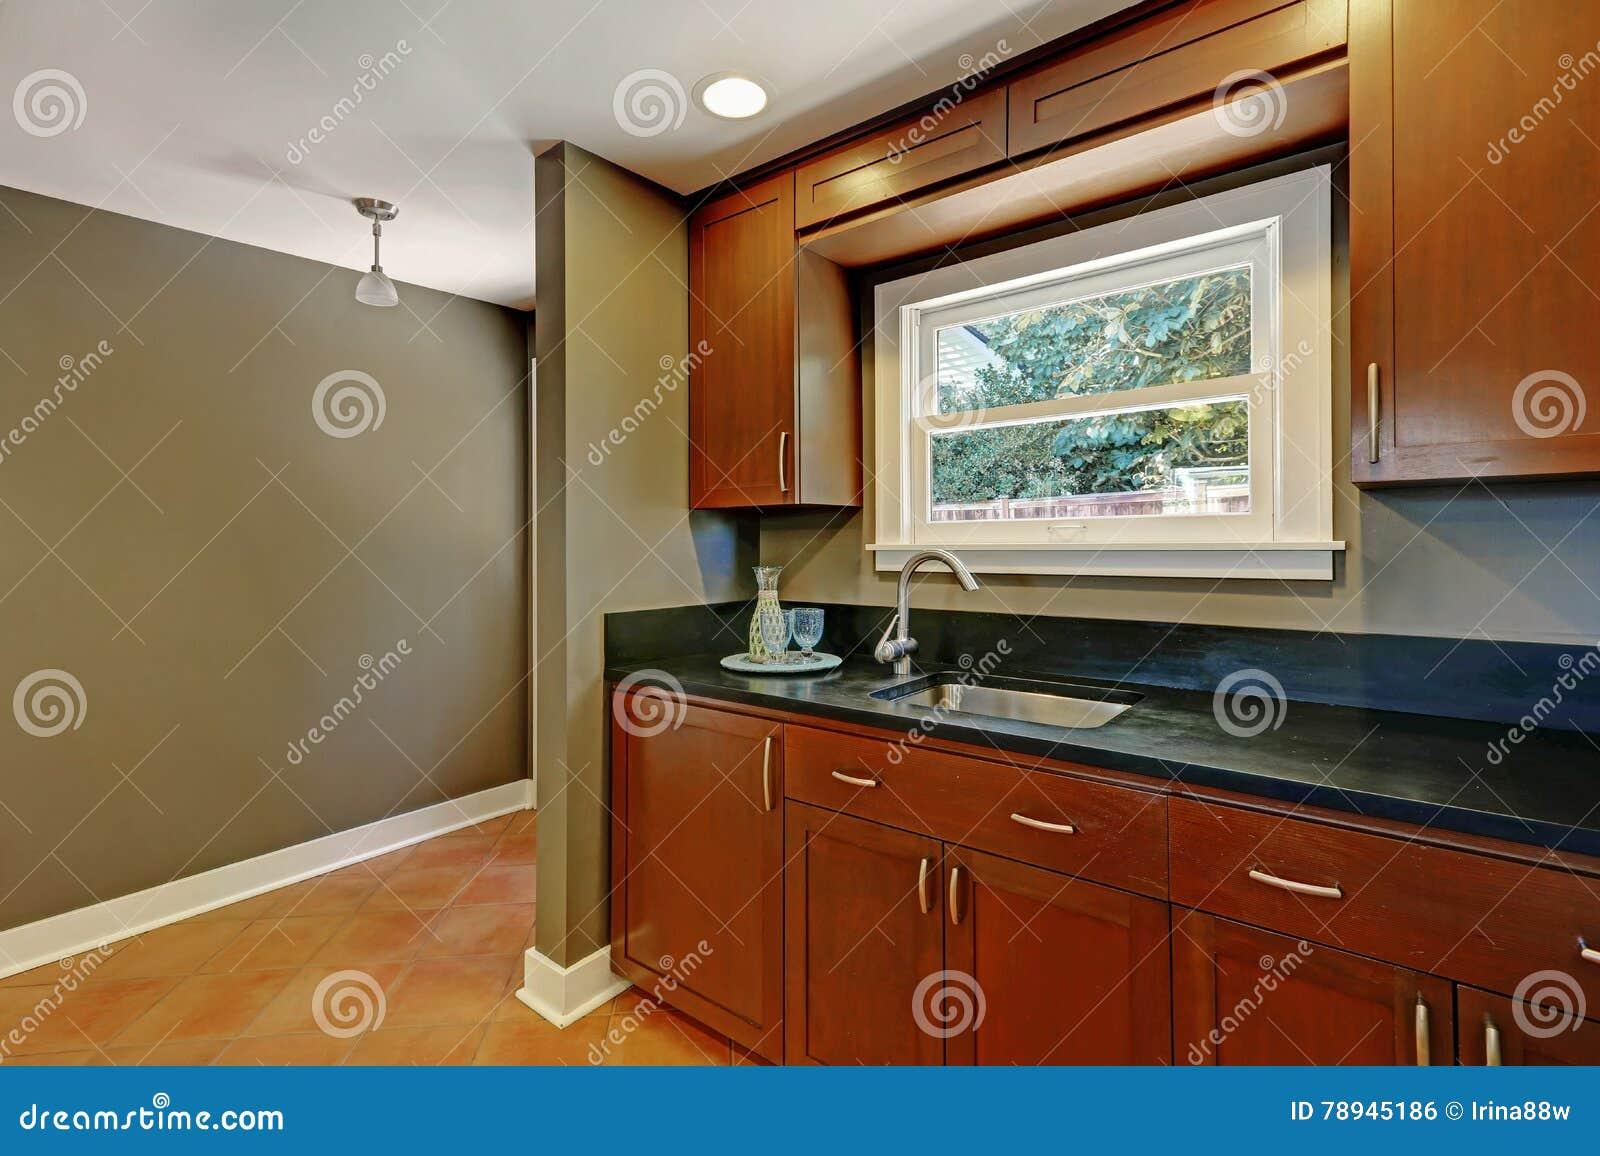 with of cabinet countertops cherry cabinets kitchen scheme granite mahogany